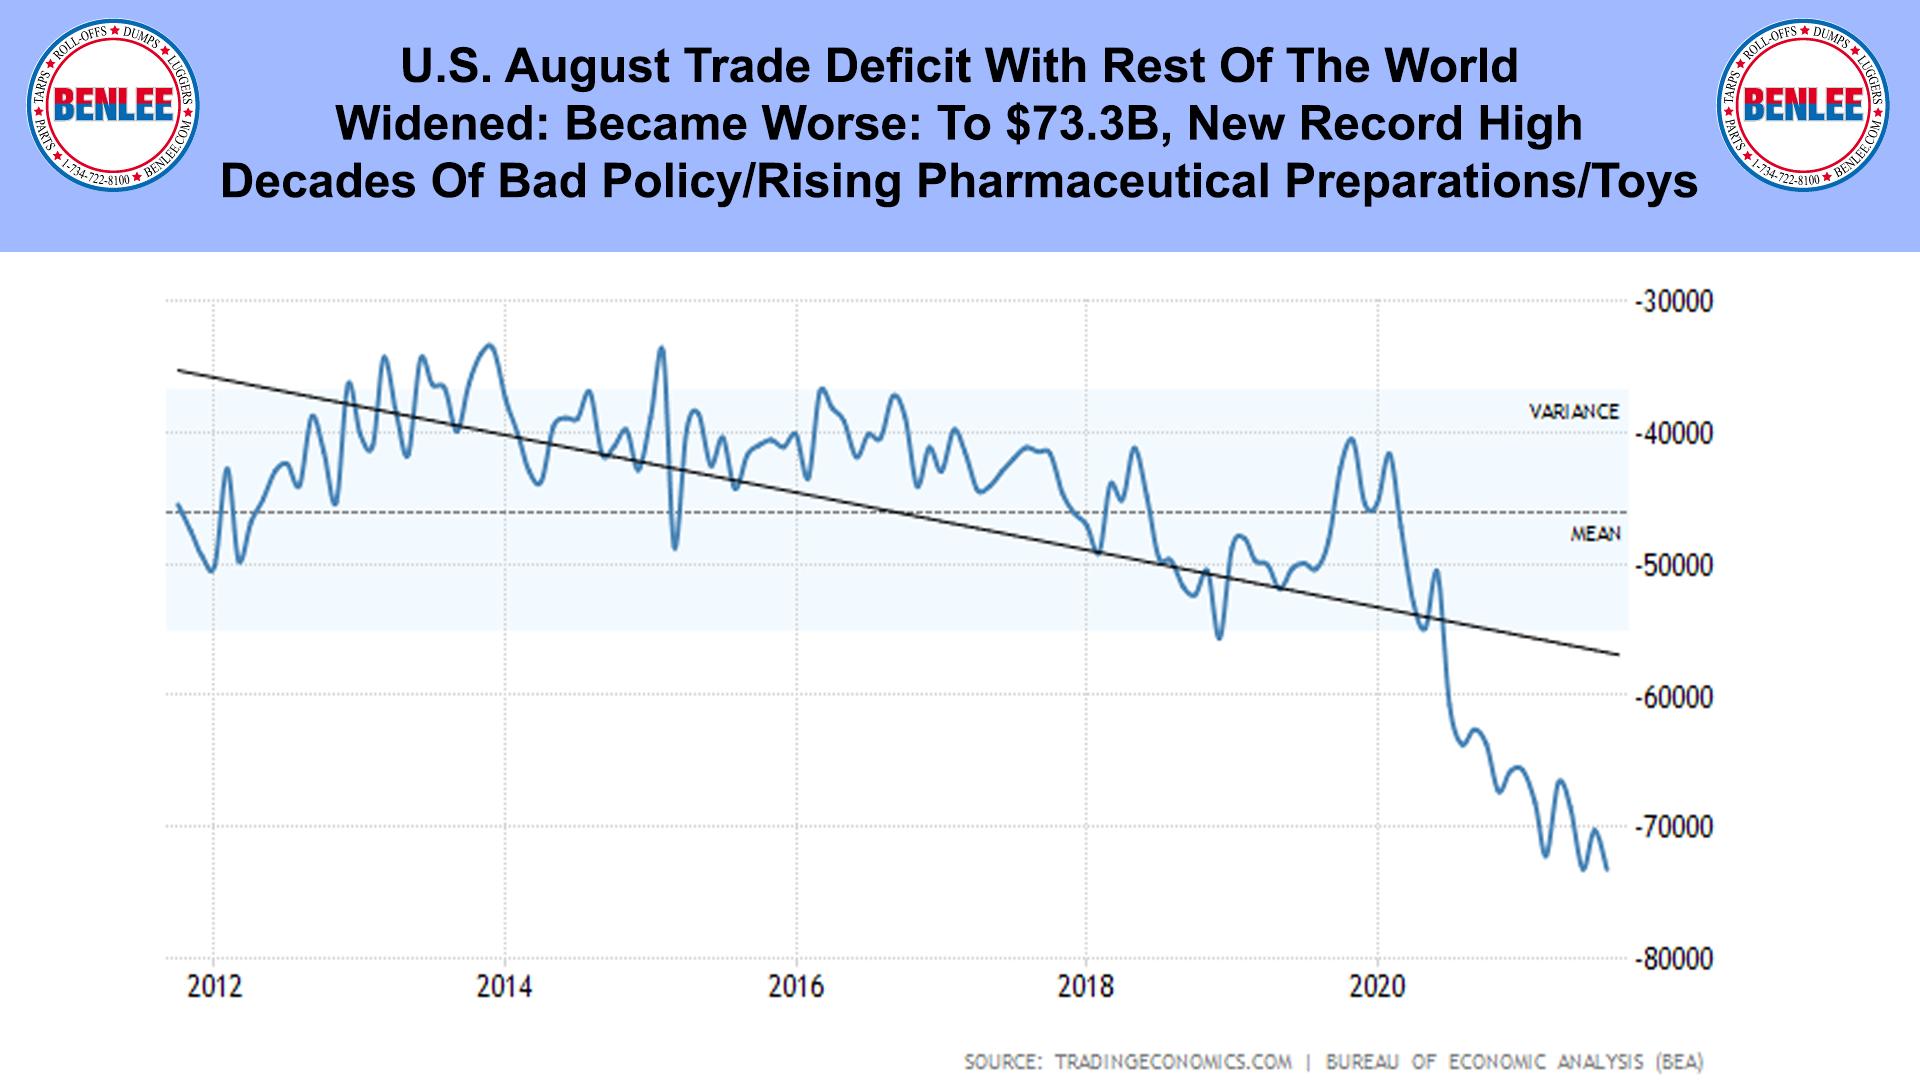 U.S. August Trade Deficit